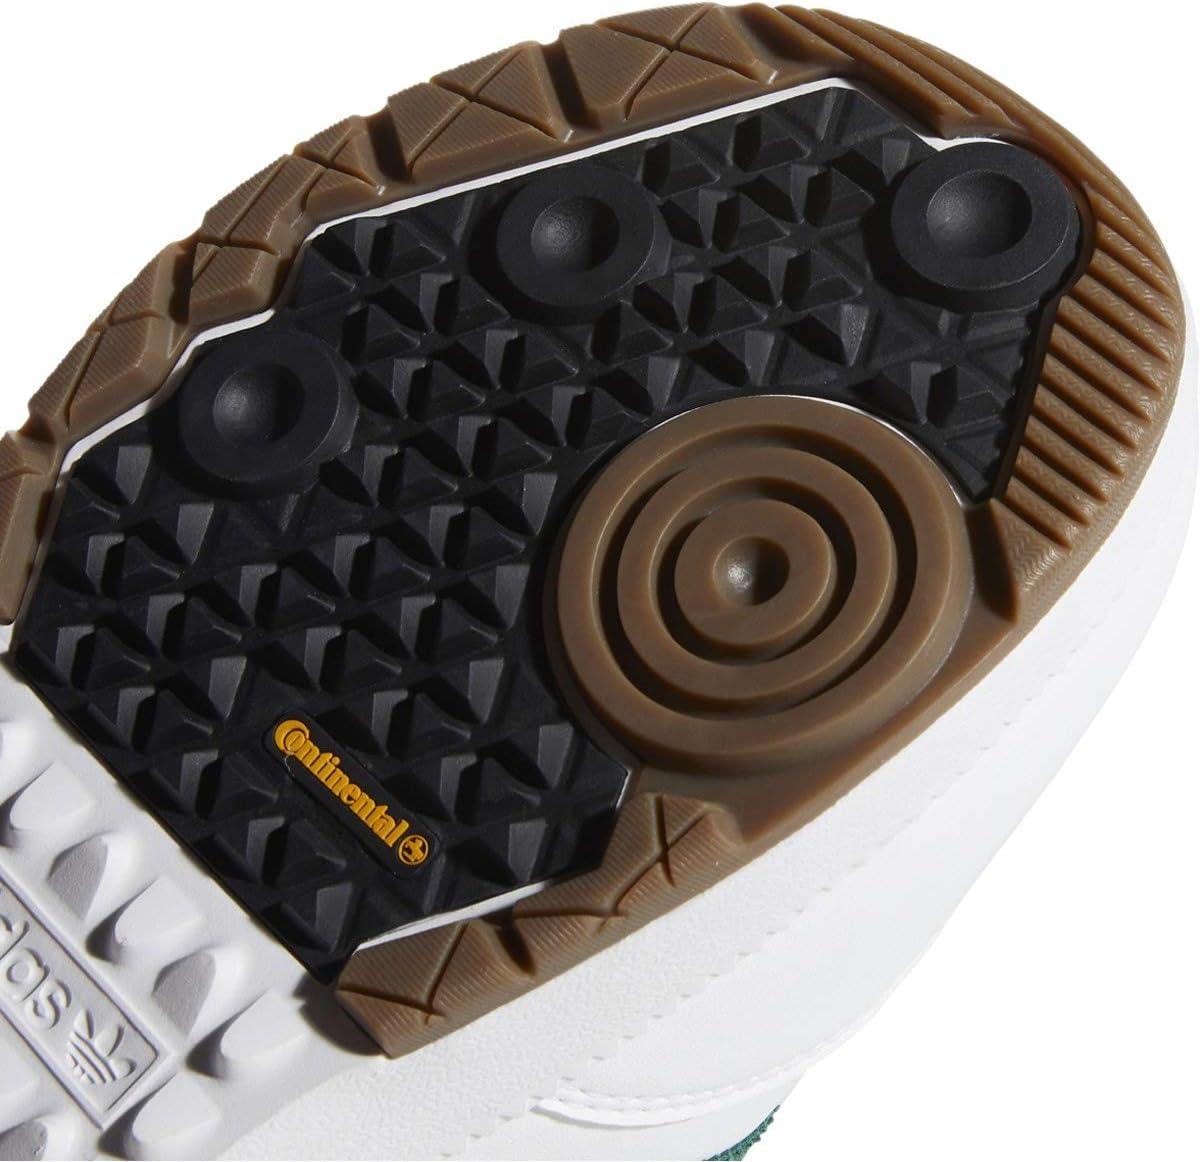 Amazon.com: adidas Samba ADV 2020 - Botas de snowboard ...